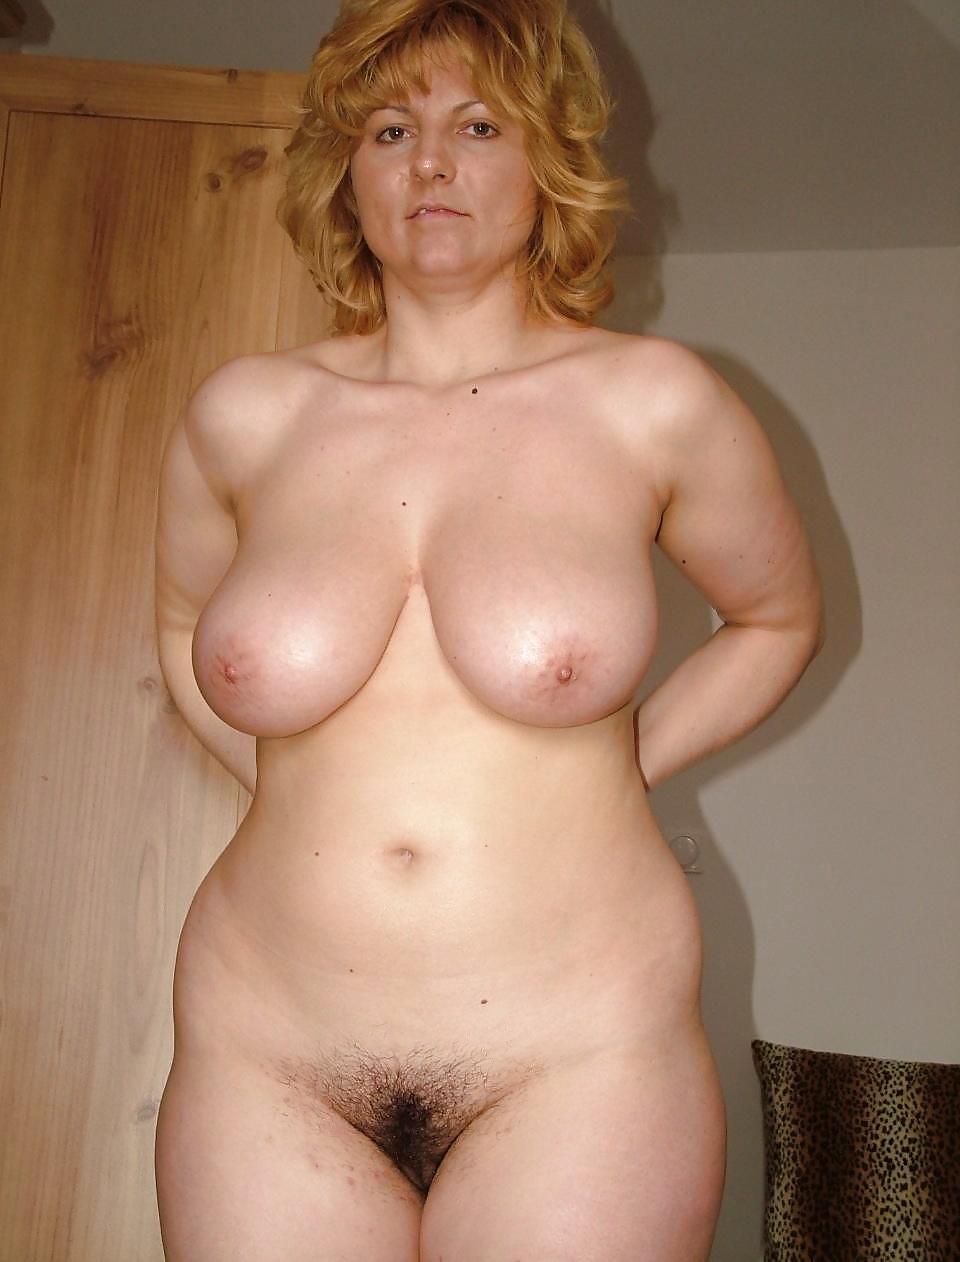 Natural mature women pics-6395